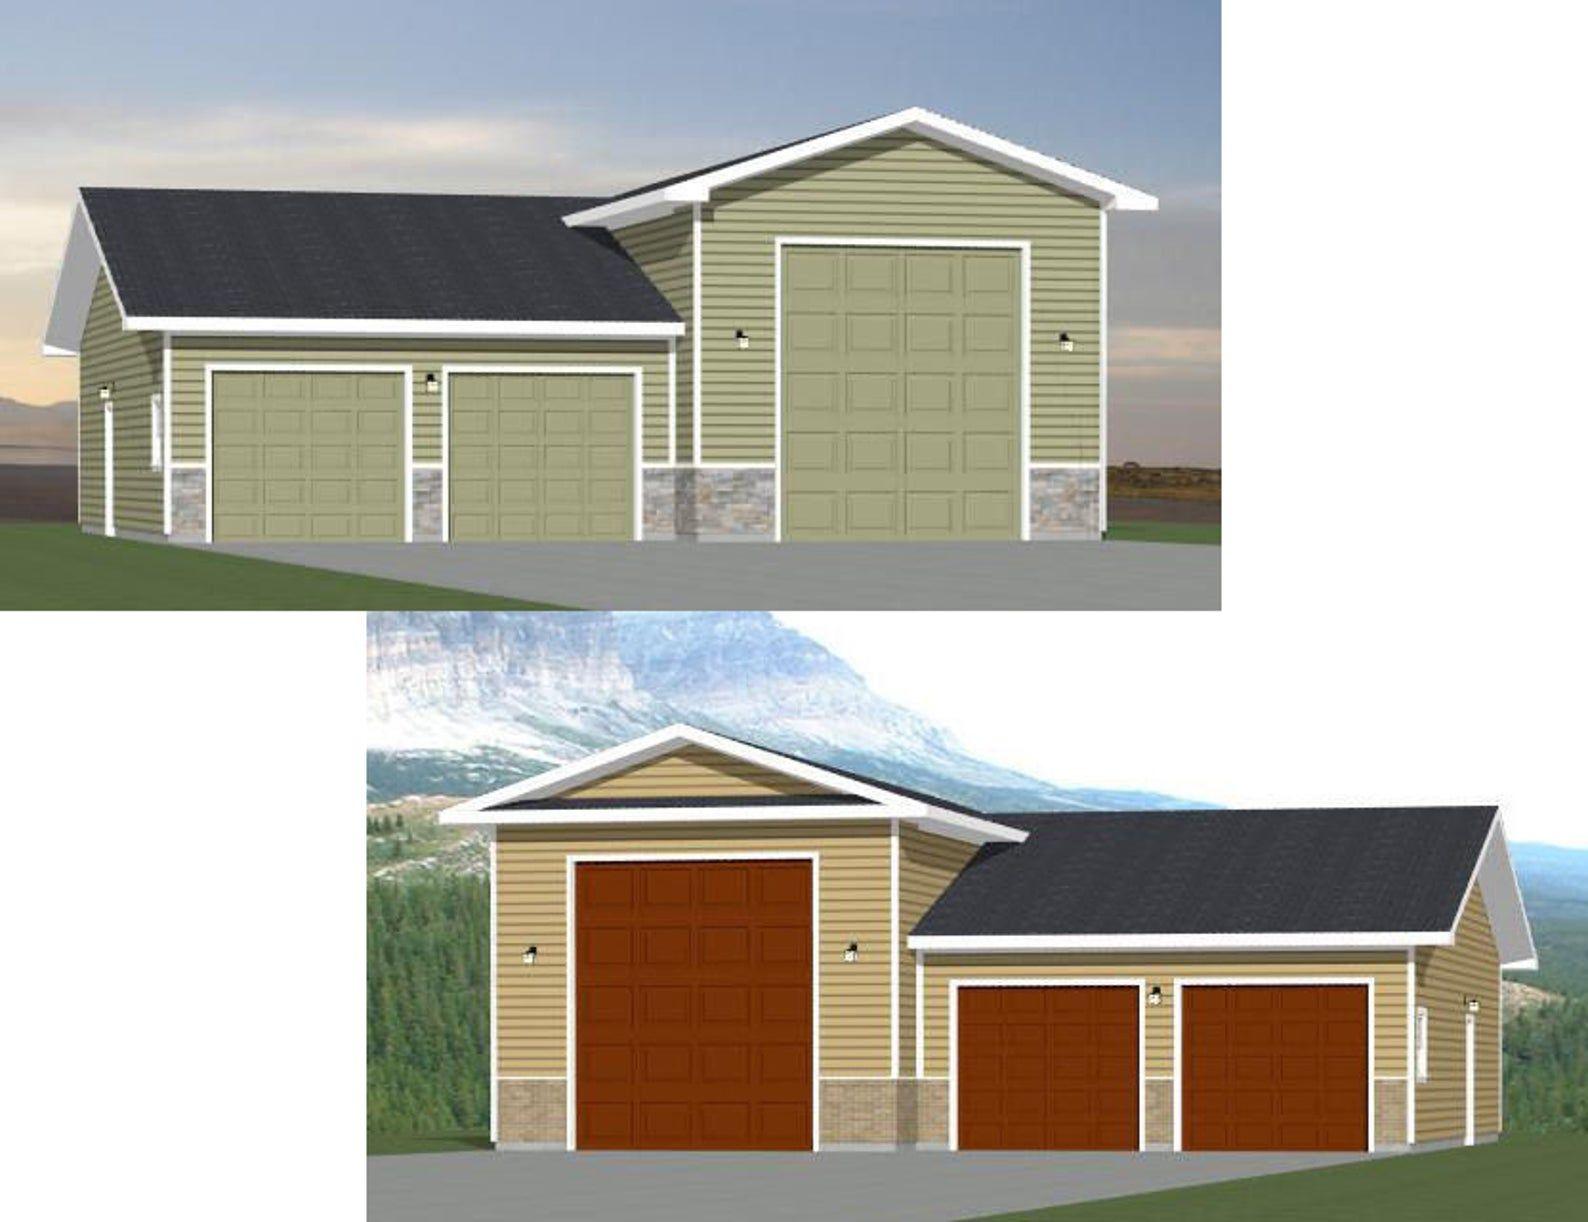 44x48 2 Car 1 Rv Garages 1200 Sq Ft Pdf Floor Plan Etsy Large Garage Plans Rv Garage Plans Floor Plans